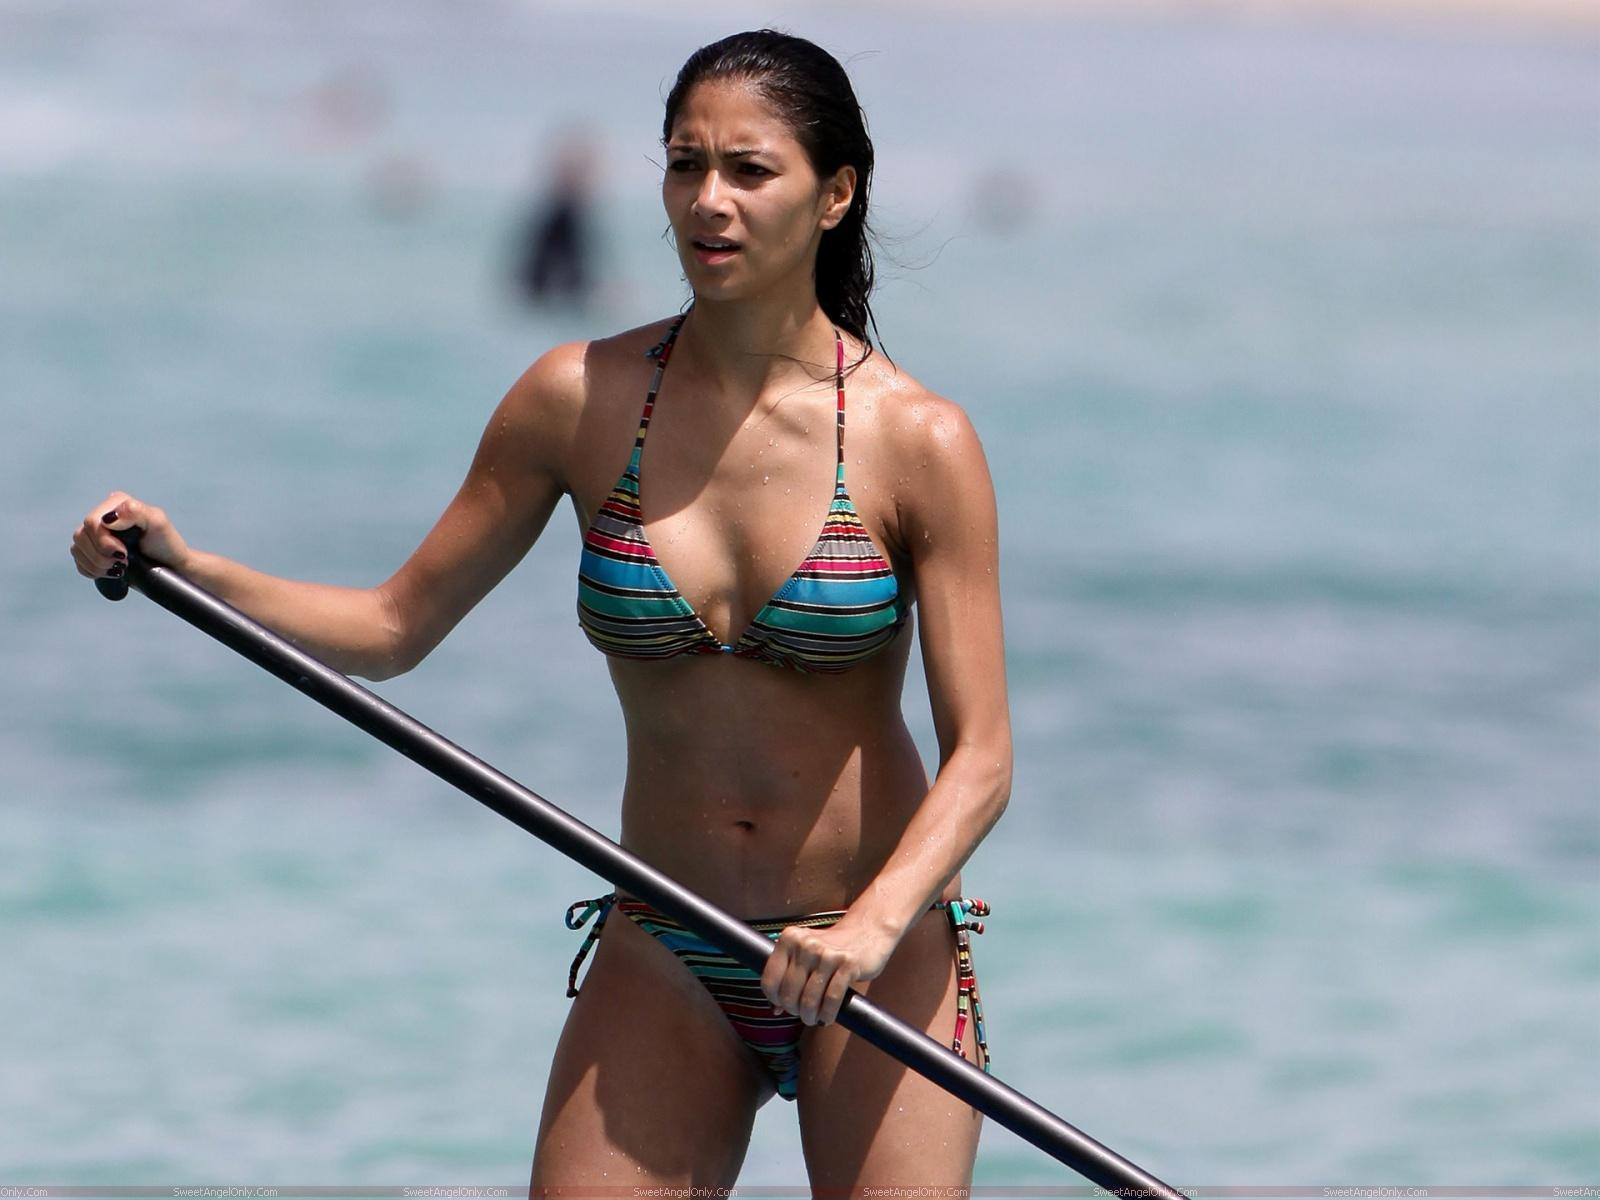 http://1.bp.blogspot.com/-U2NgzPUngRw/Tuc4YNpZUAI/AAAAAAAAEg0/CKLWyL-guEk/s1600/hot-actress-nicole-scherzinger-bikini-wallpapers-1320822584nicole_scherzinger_in_bikini_swimwear.jpg